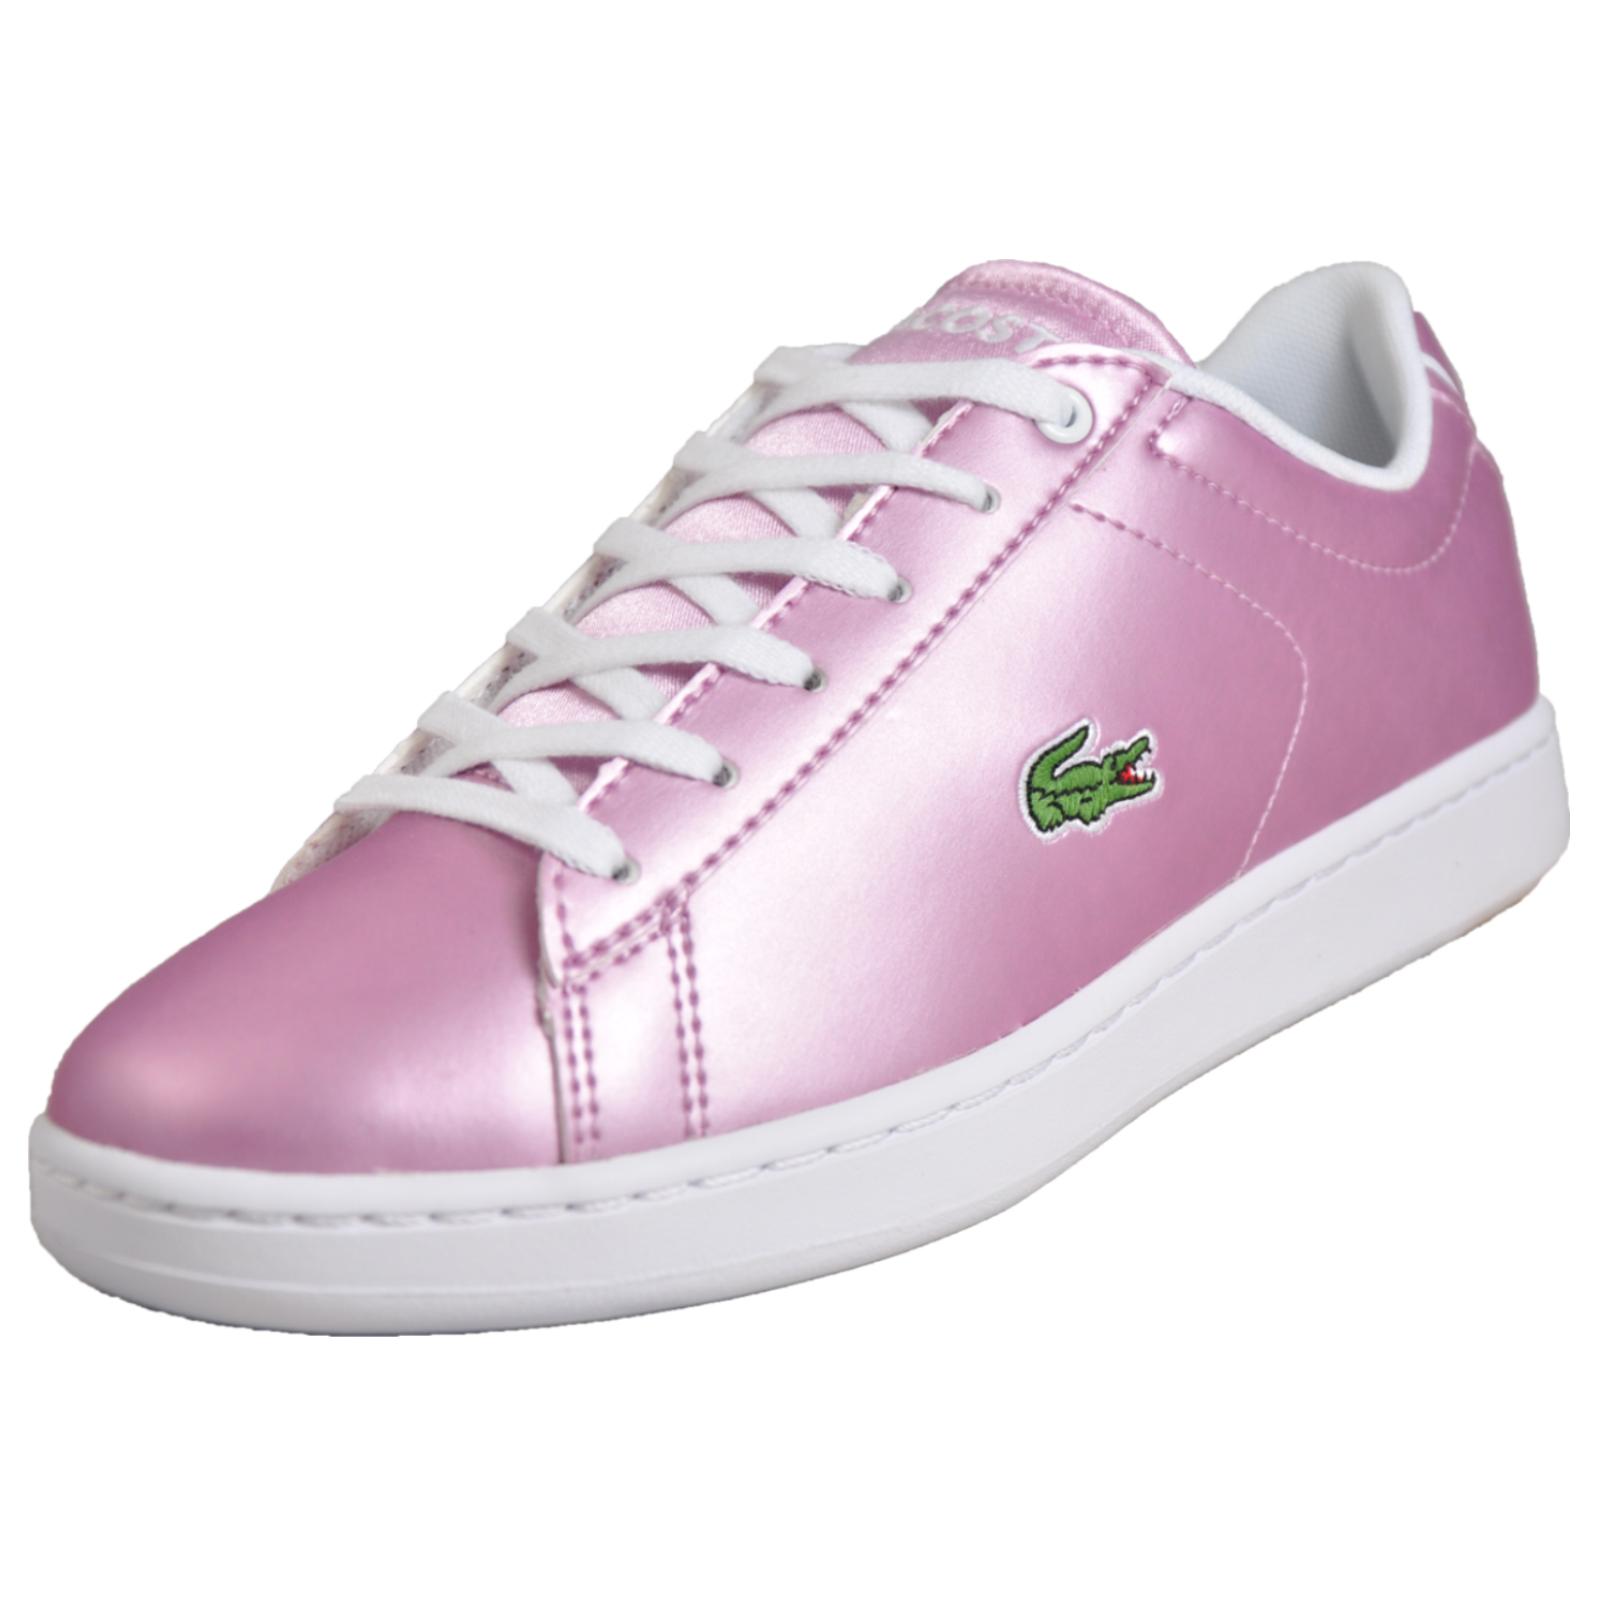 ccb6f13da Details about Lacoste Carnaby Evo 218 Junior Girls Classic Designer Retro  Trainers B Grade